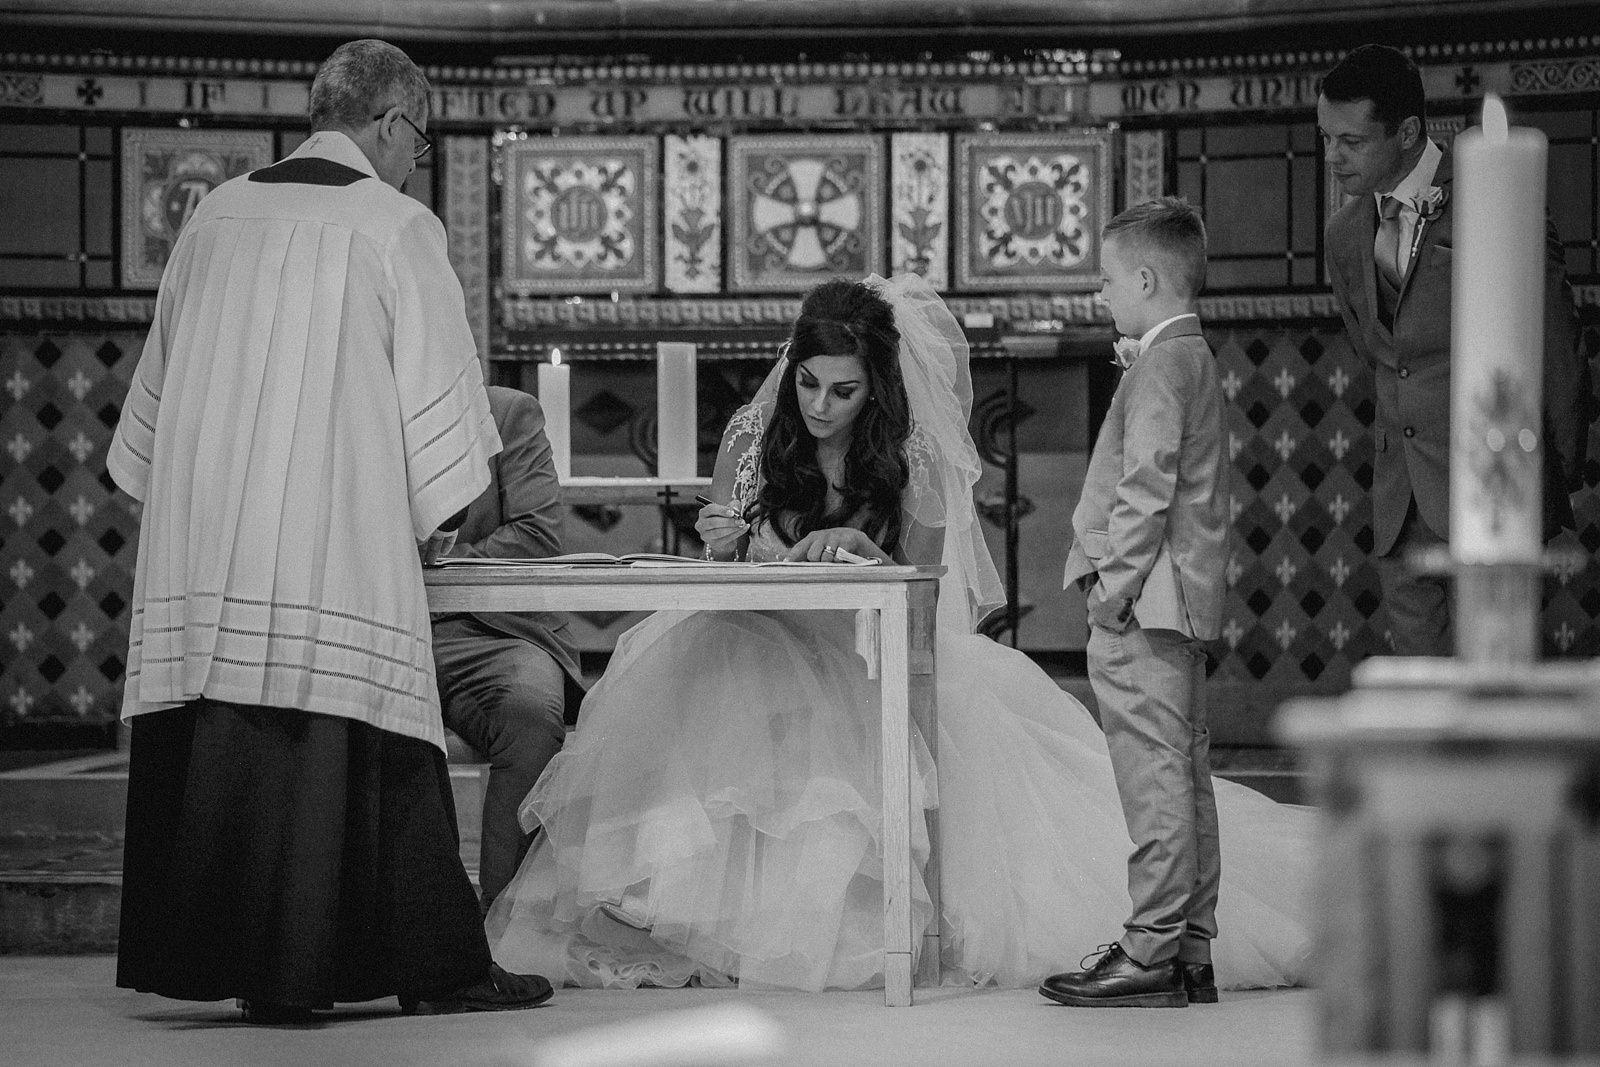 Galia lahav haute couture Giselle dress - West Tower Wedding Photography by Lancashire wedding Photographer Wes Simpson_0021